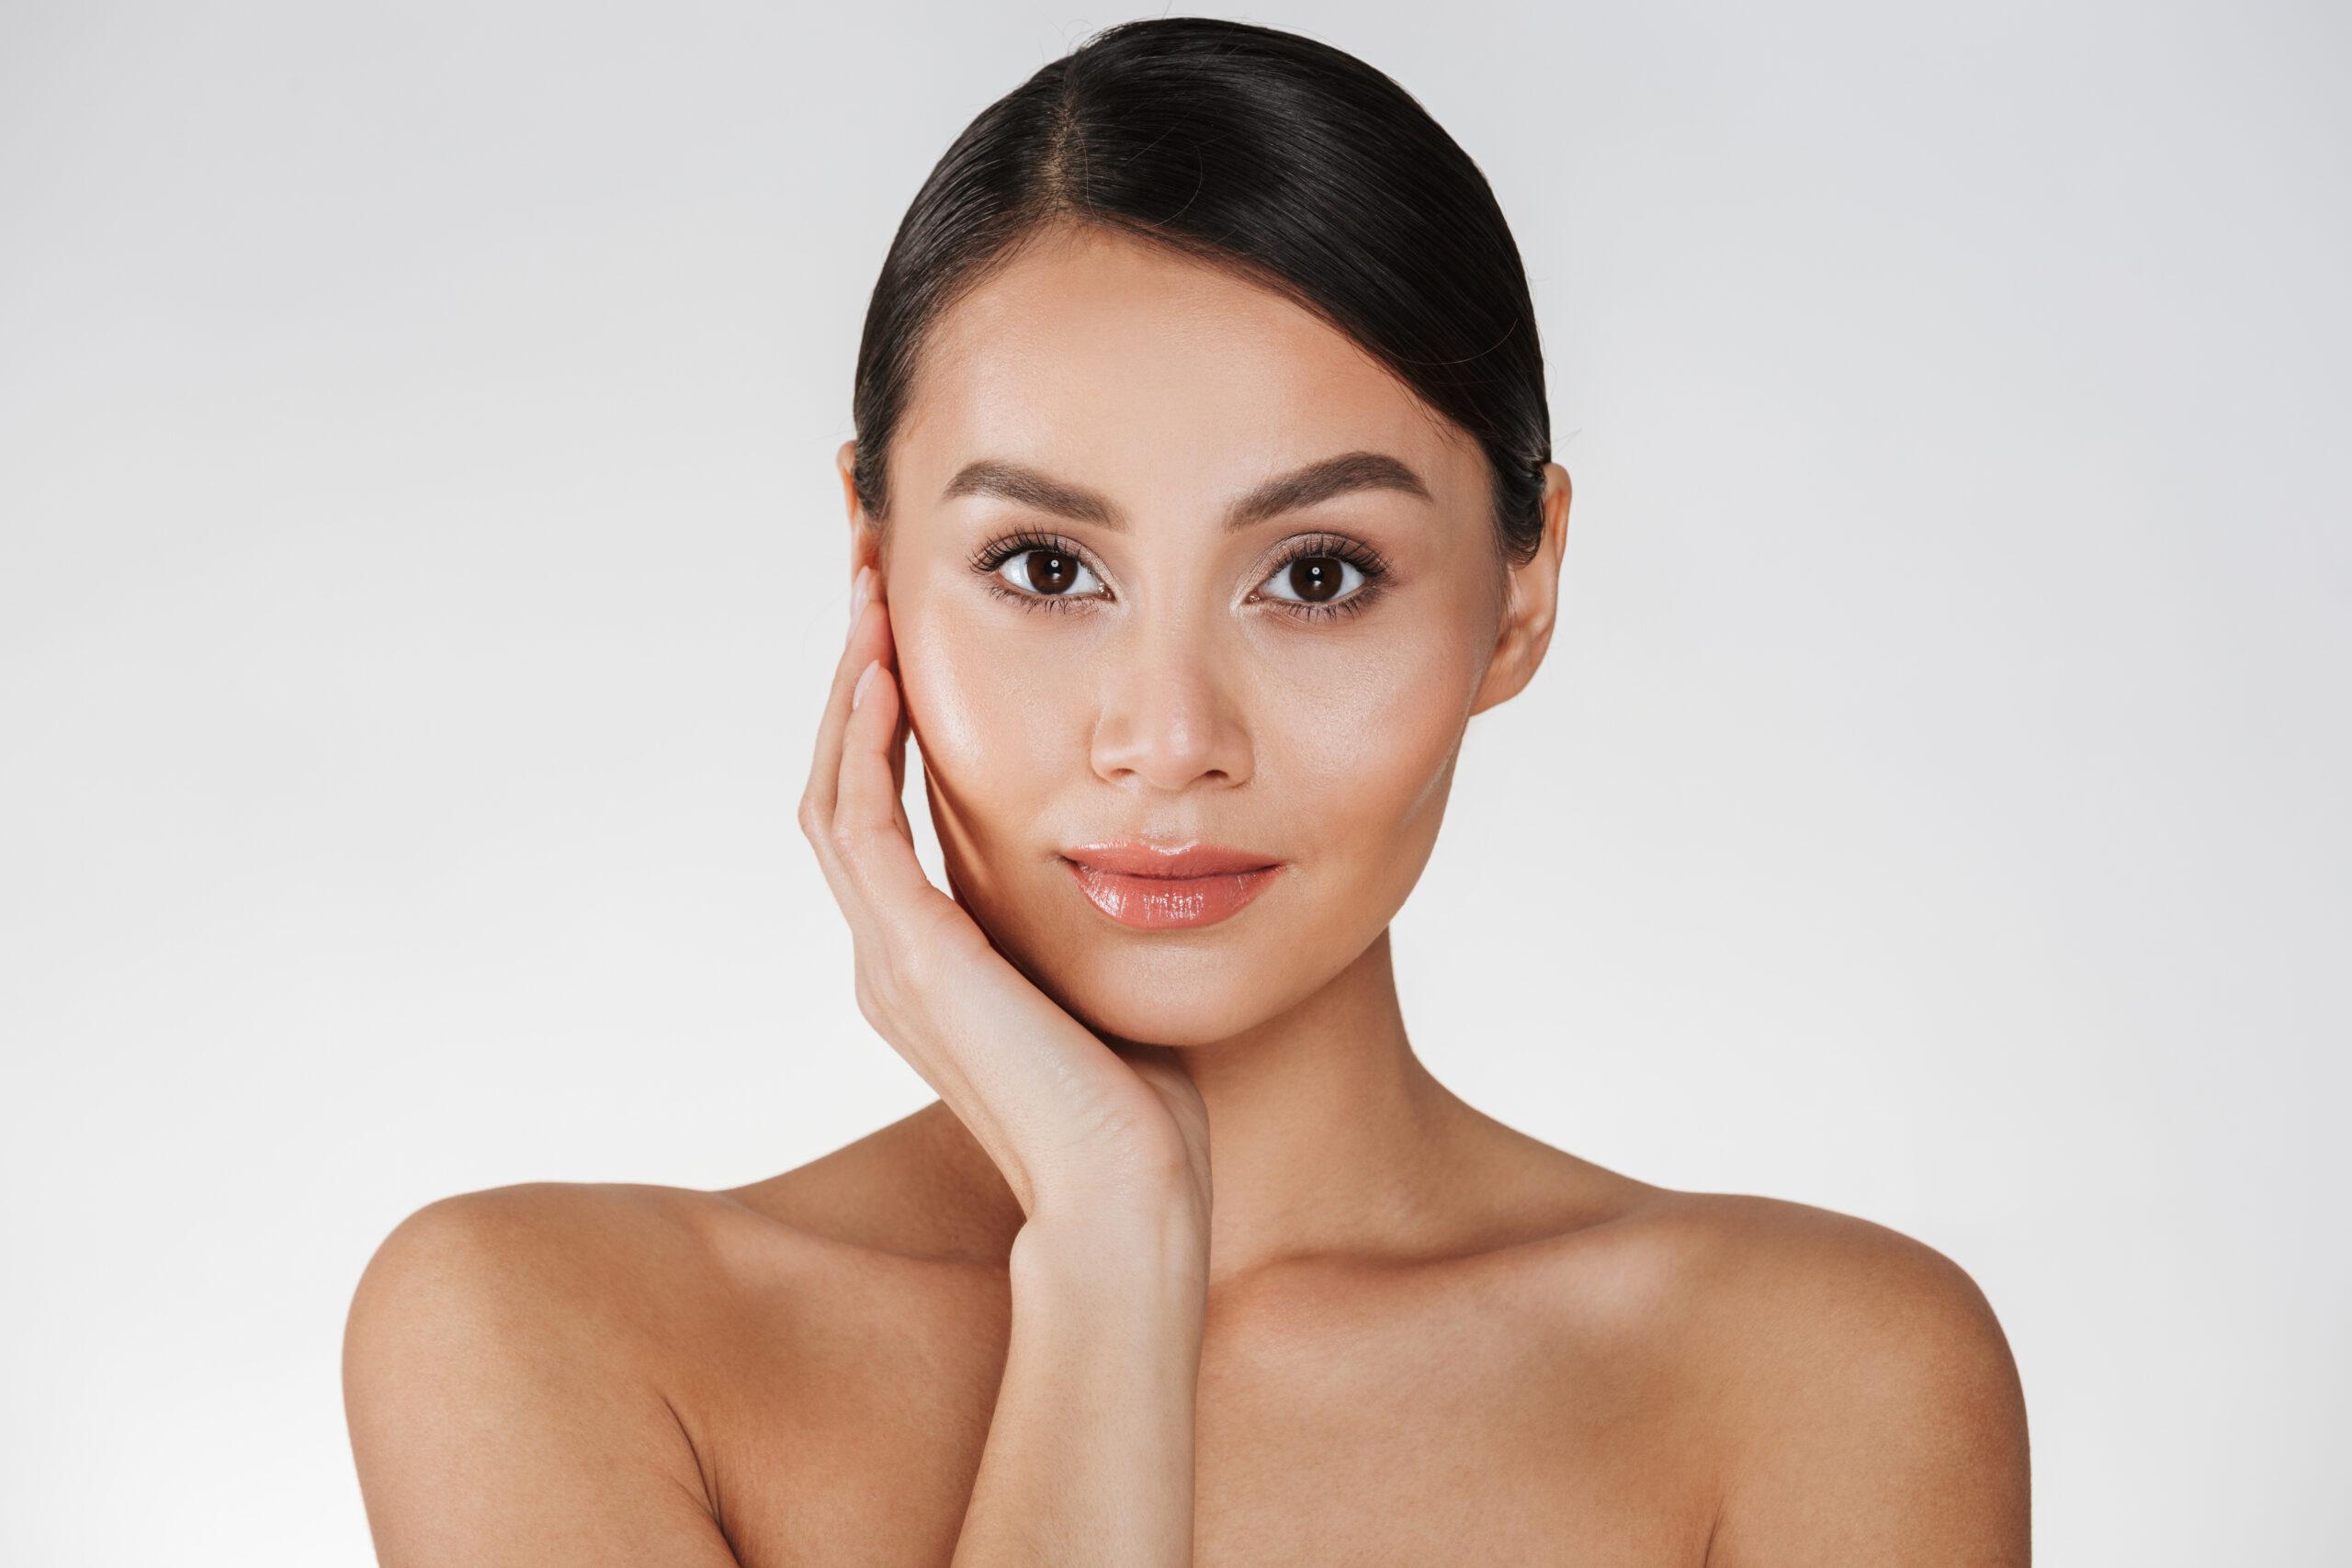 Bioestimuladores de Colágeno no combate a flacidez facial